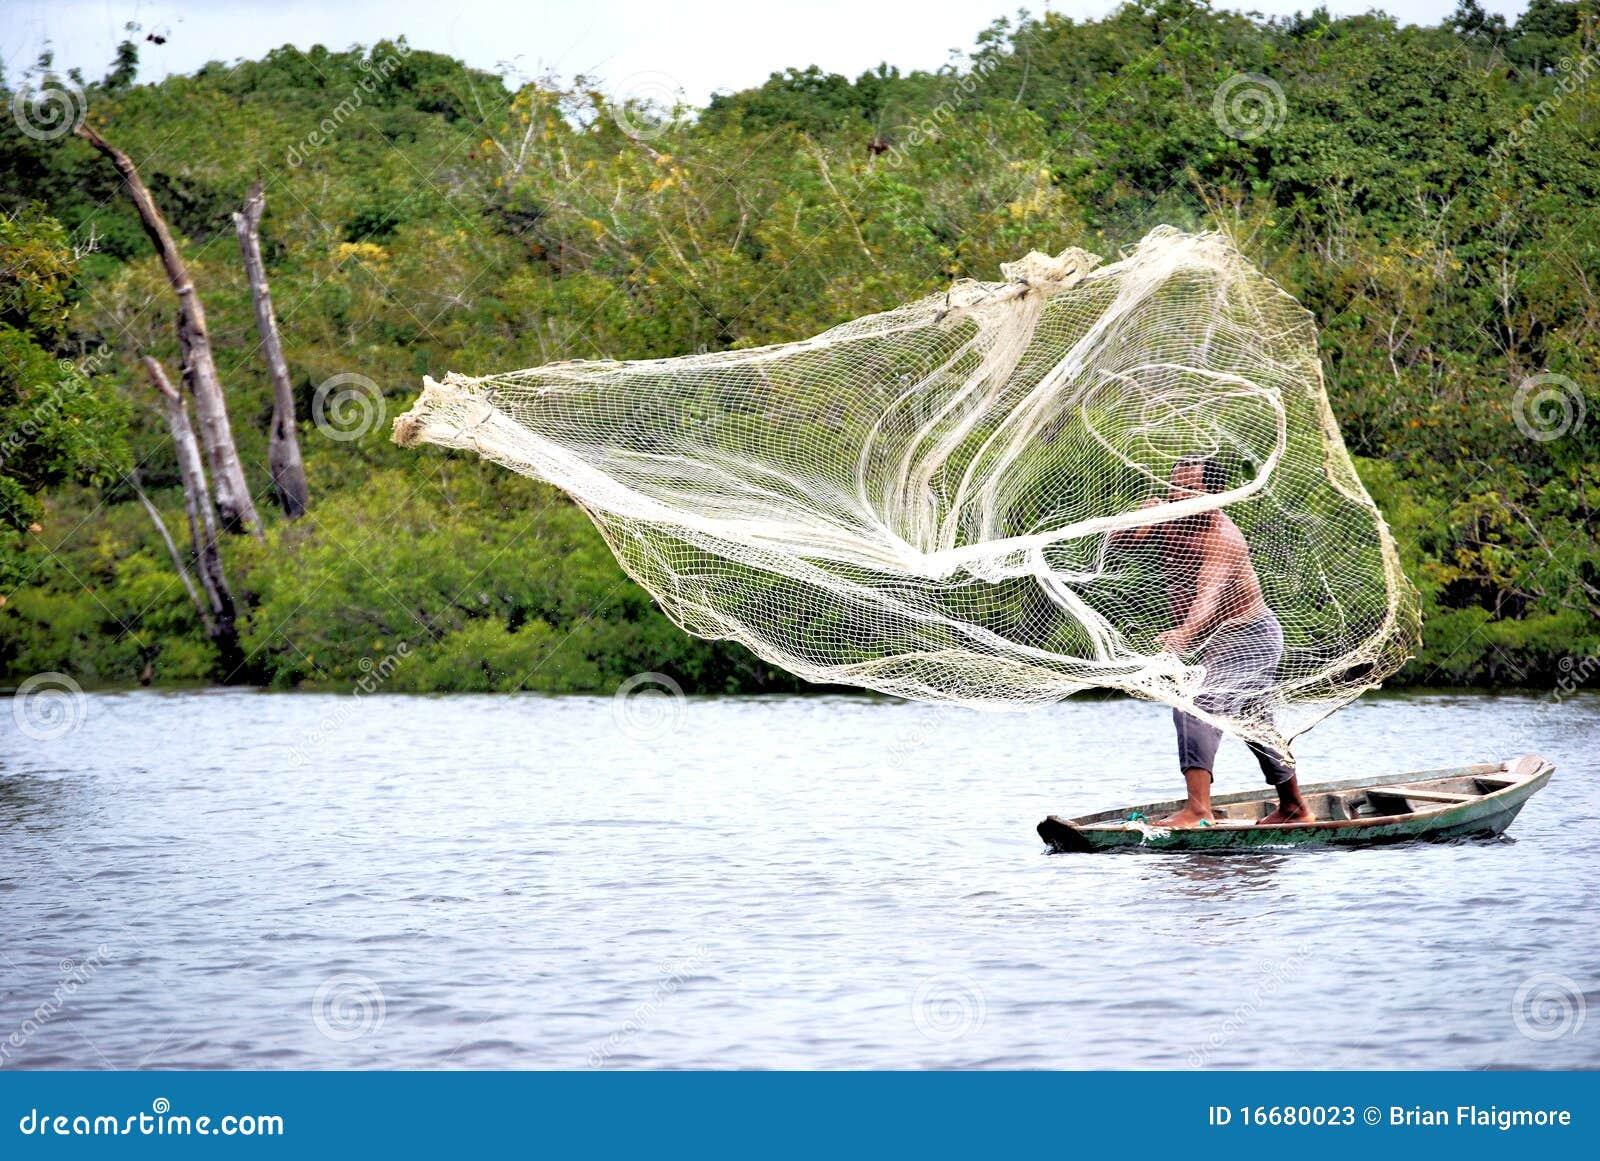 Casting net in amazon editorial stock photo image 16680023 for Amazon fishing net